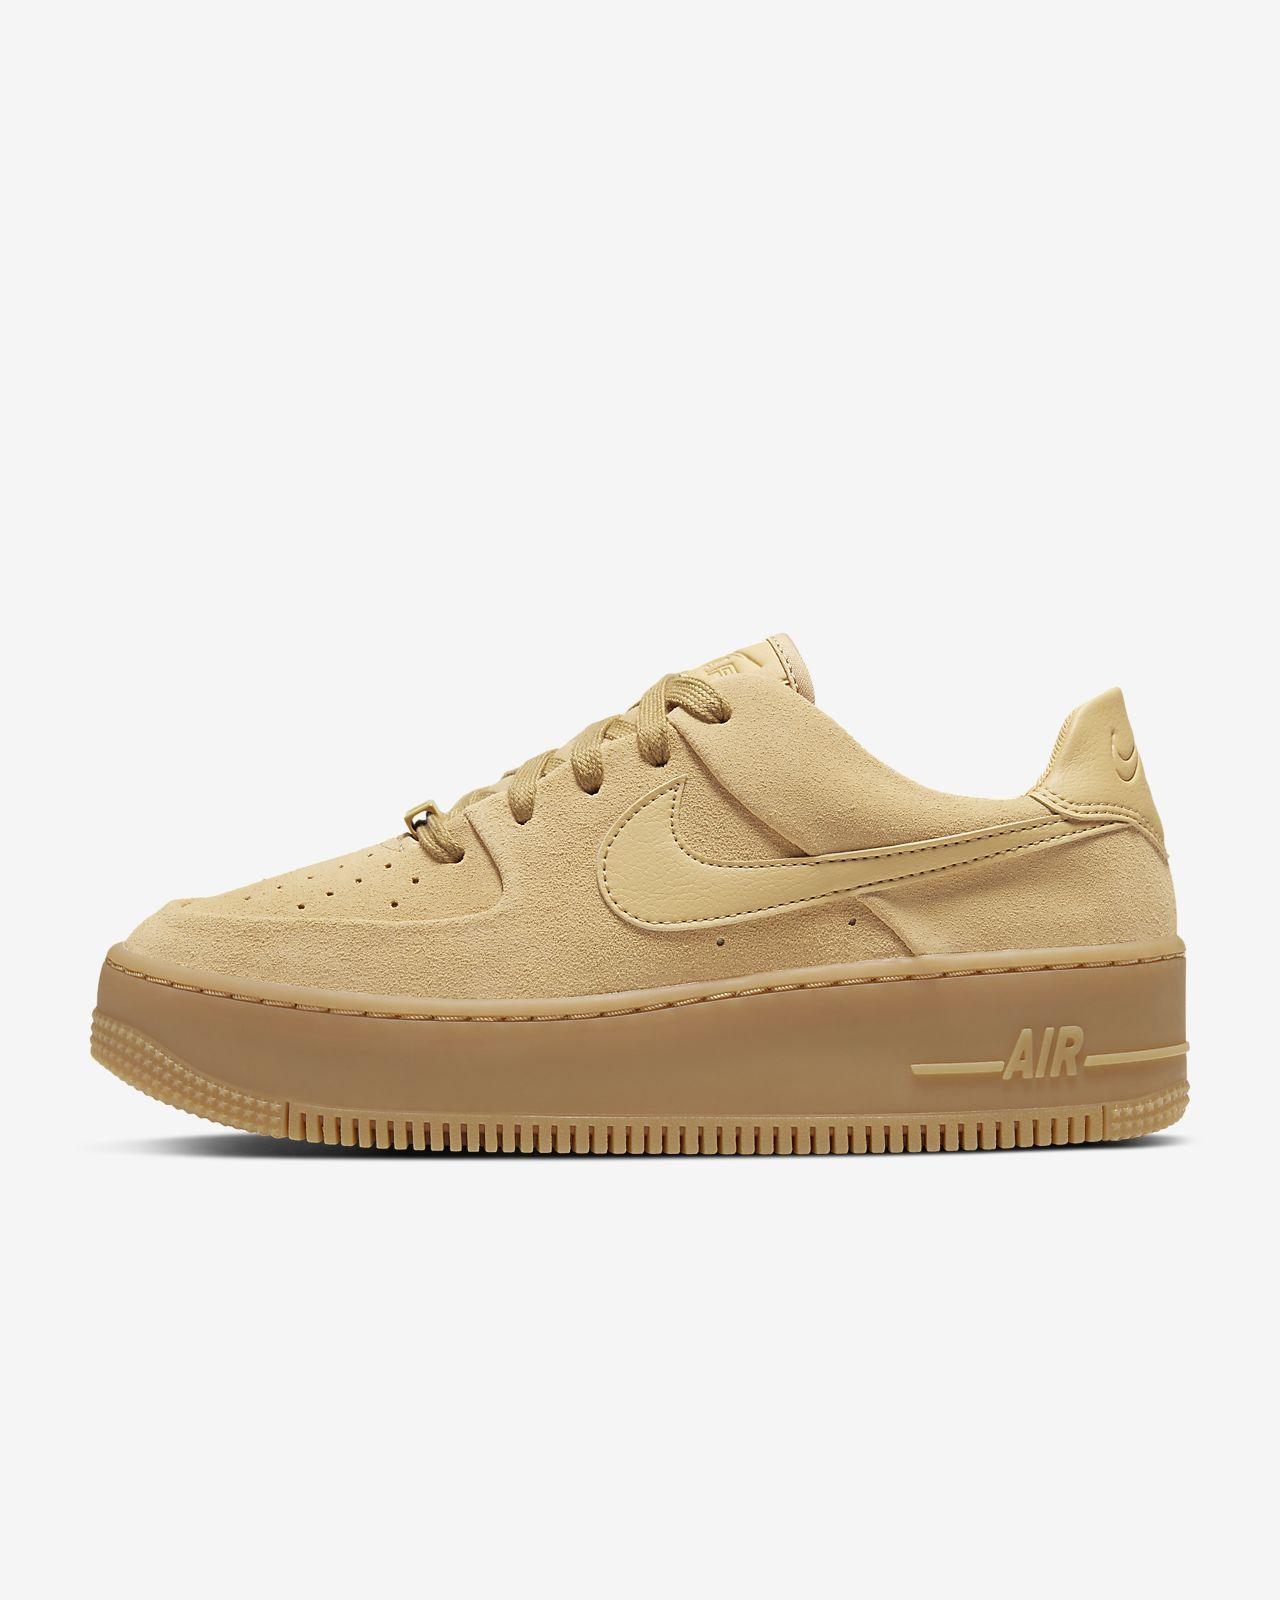 Nike Air Force 1 Low 07 LV8 Suede Mushroom Sneaker Bar Detroit